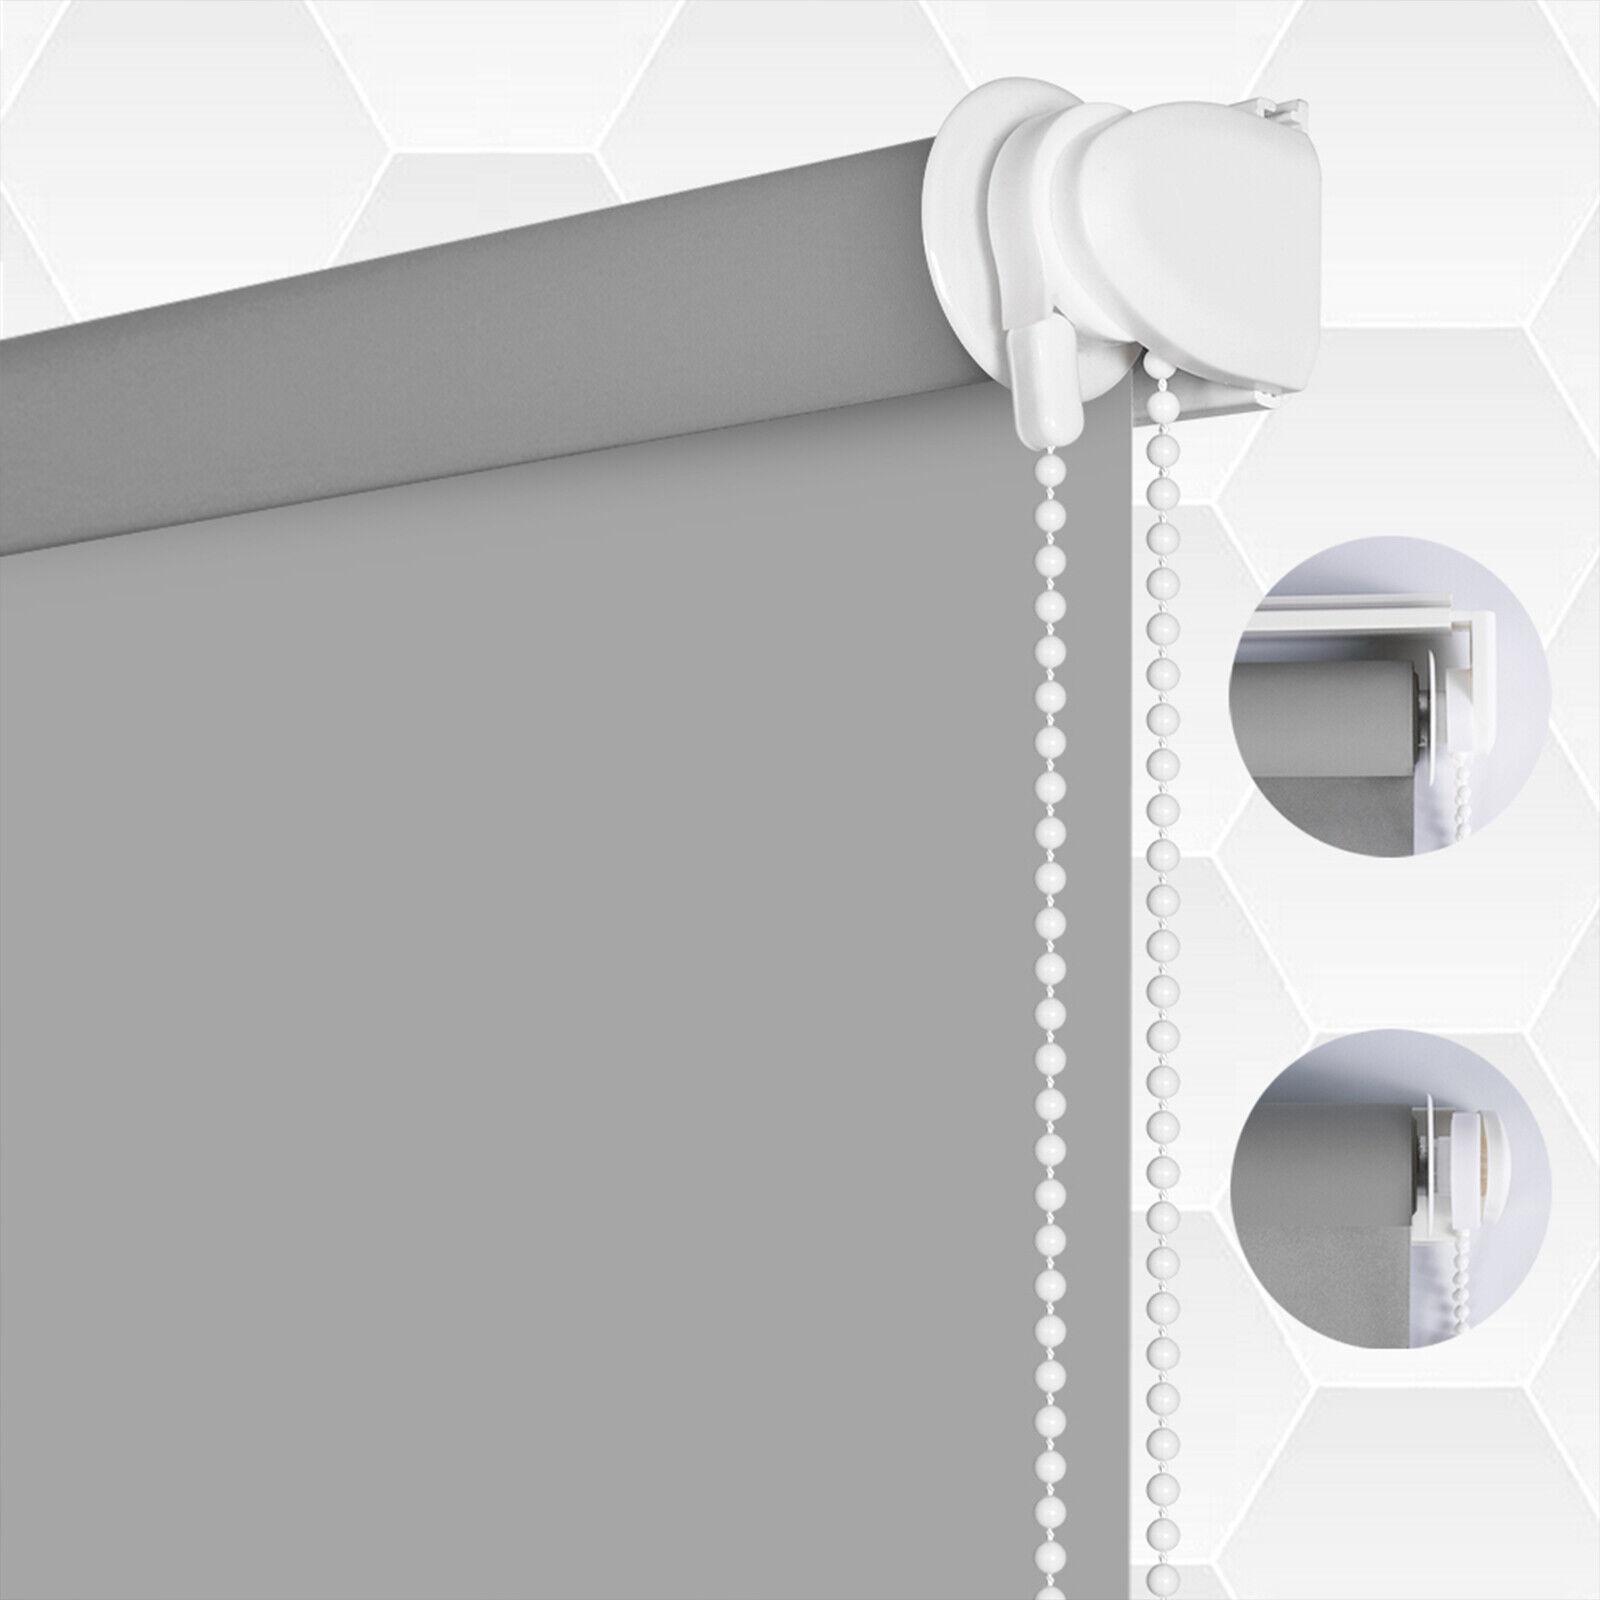 LUCKUP 100% Blackout Waterproof Fabric Window Roller Shades